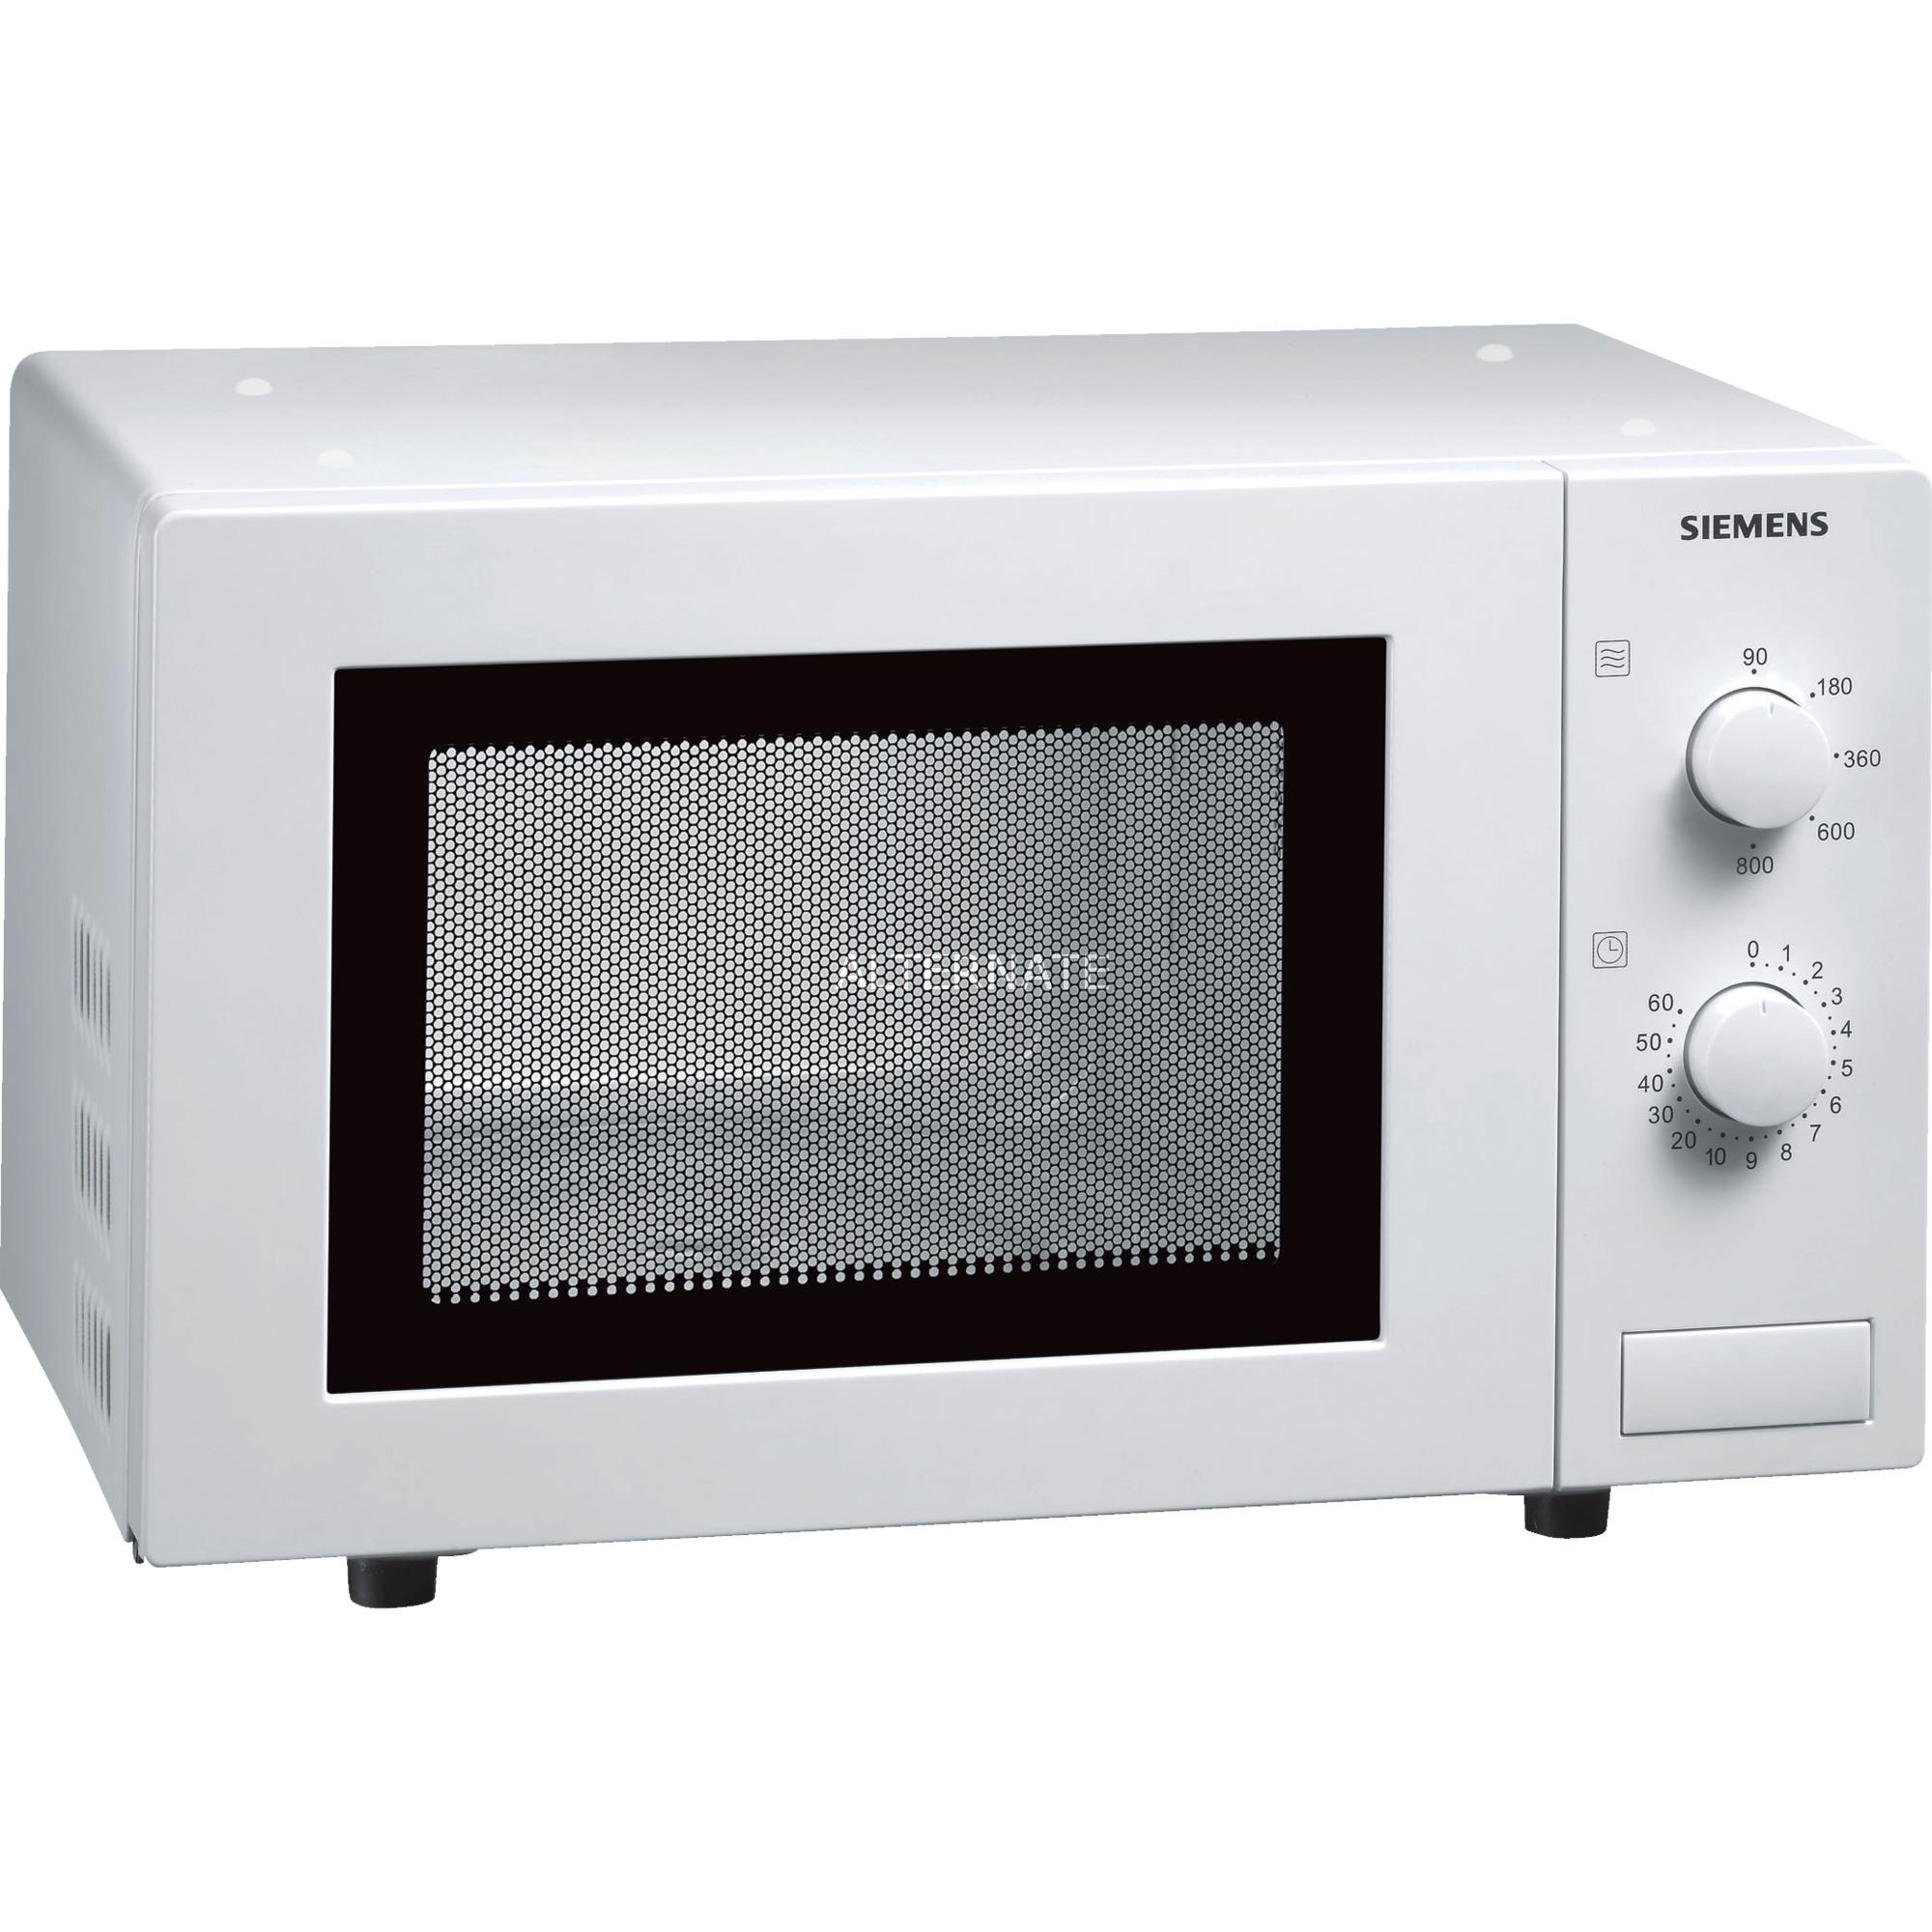 Siemens microondas siemens hf24g764 iq500 precios y - Microondas encimera ...